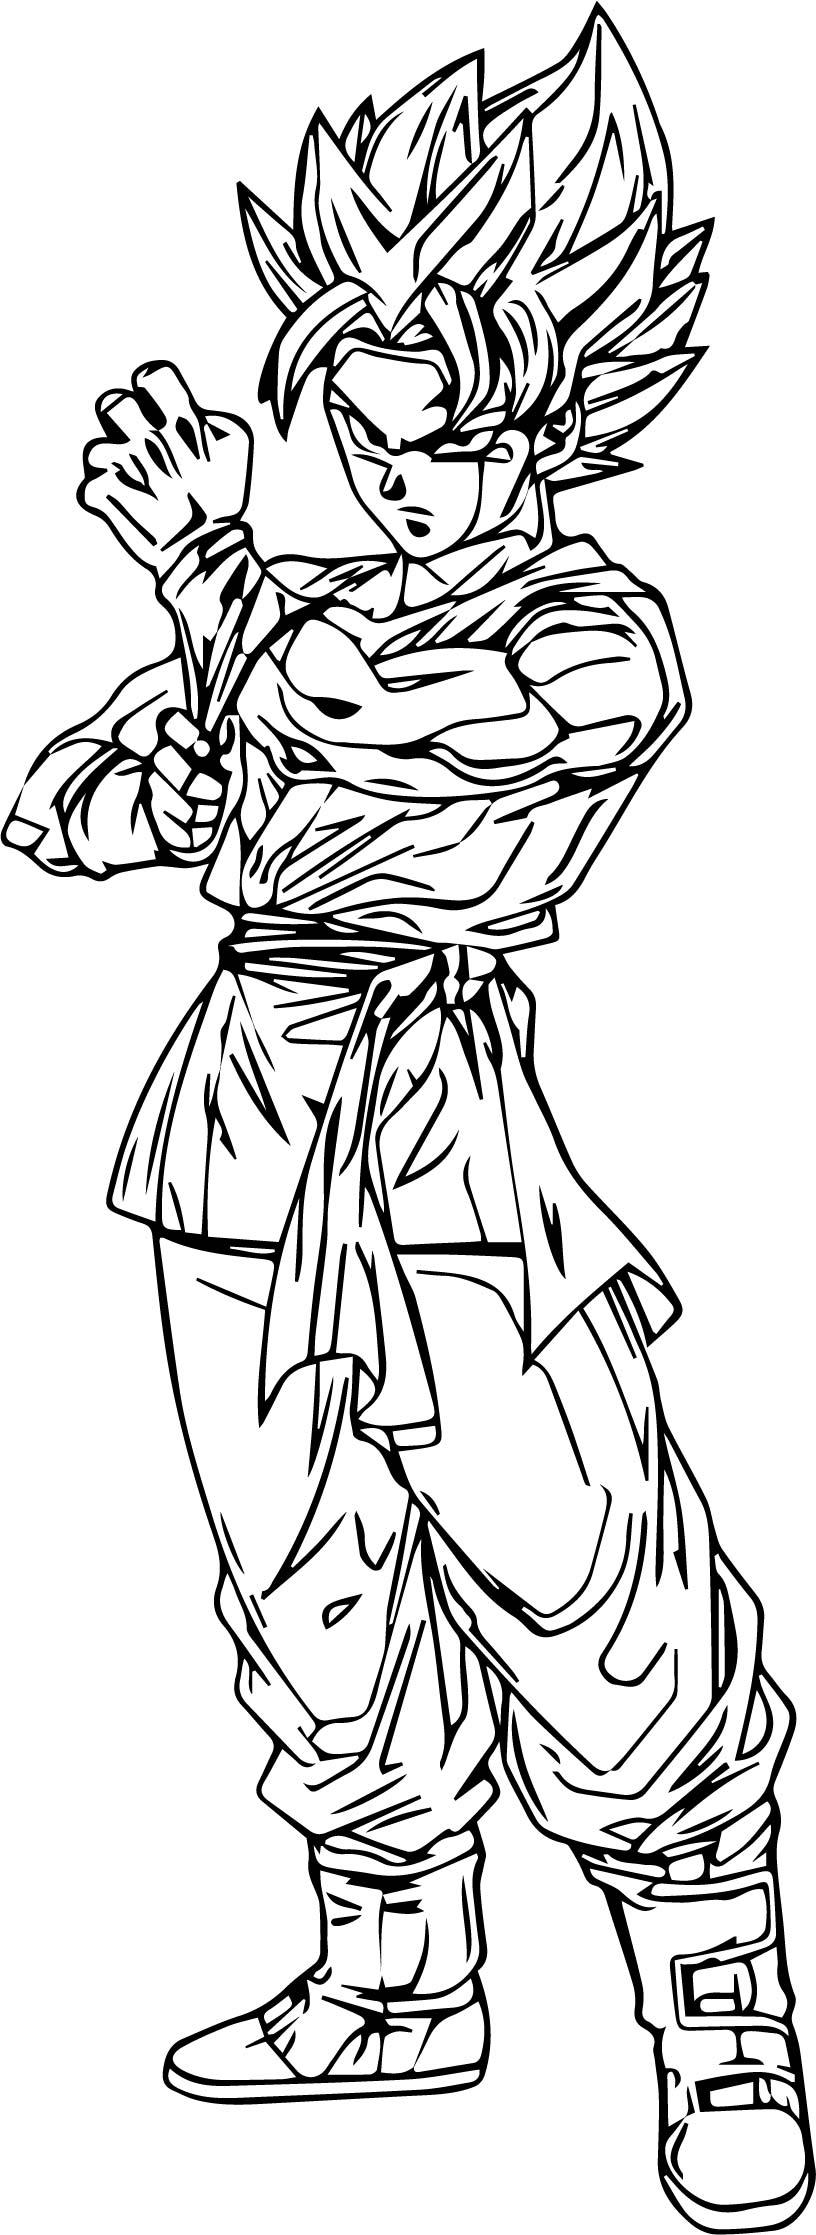 Goku We Coloring Page 038